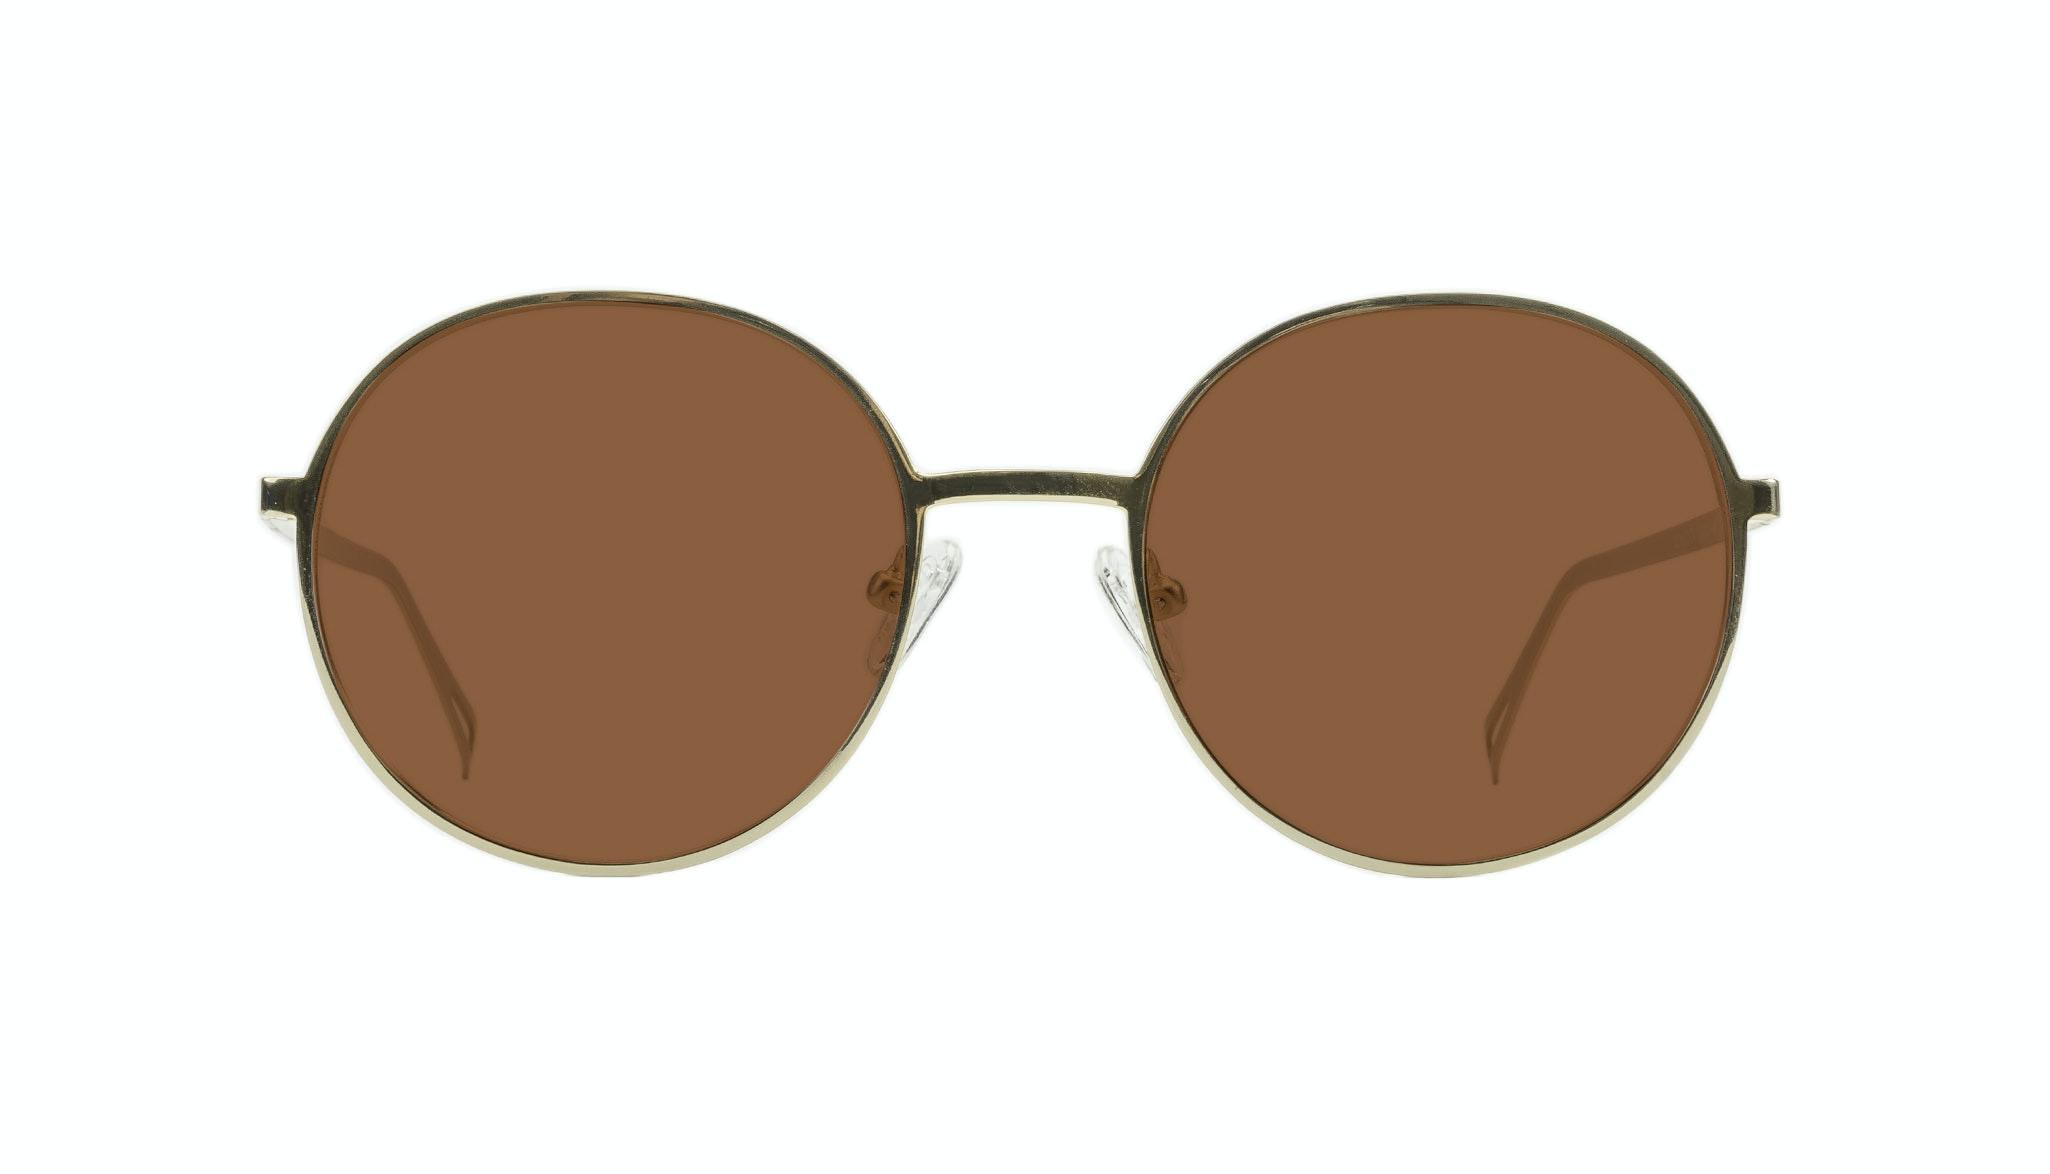 Affordable Fashion Glasses Round Sunglasses Men Varna Gold